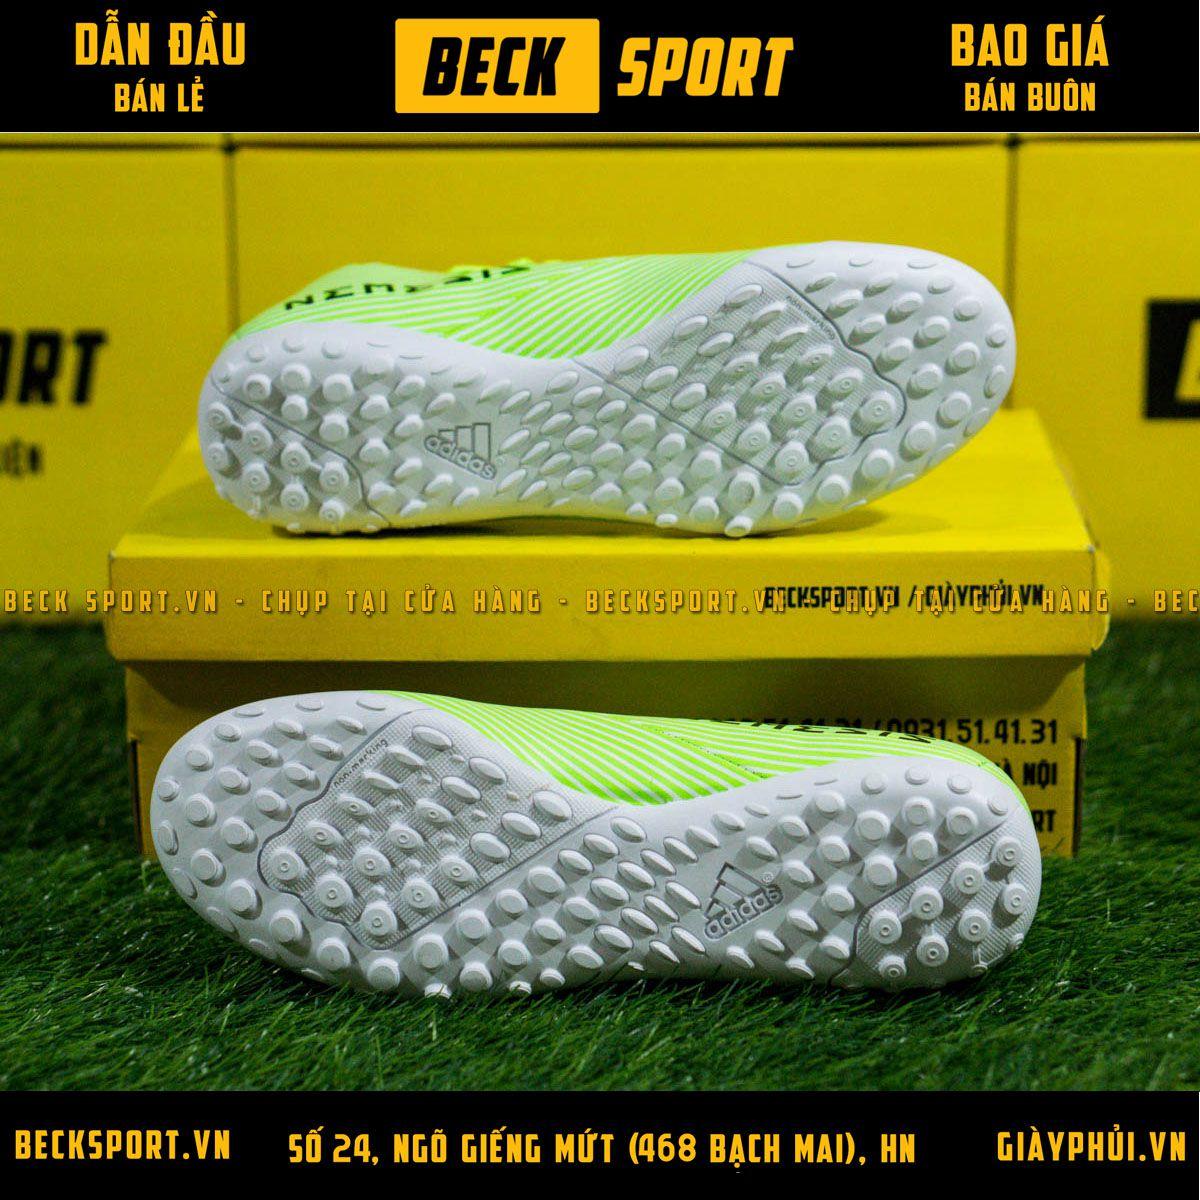 Giày Bóng Đá Adidas Nemeziz 19.4 Xanh Lá Vạch Đen TF